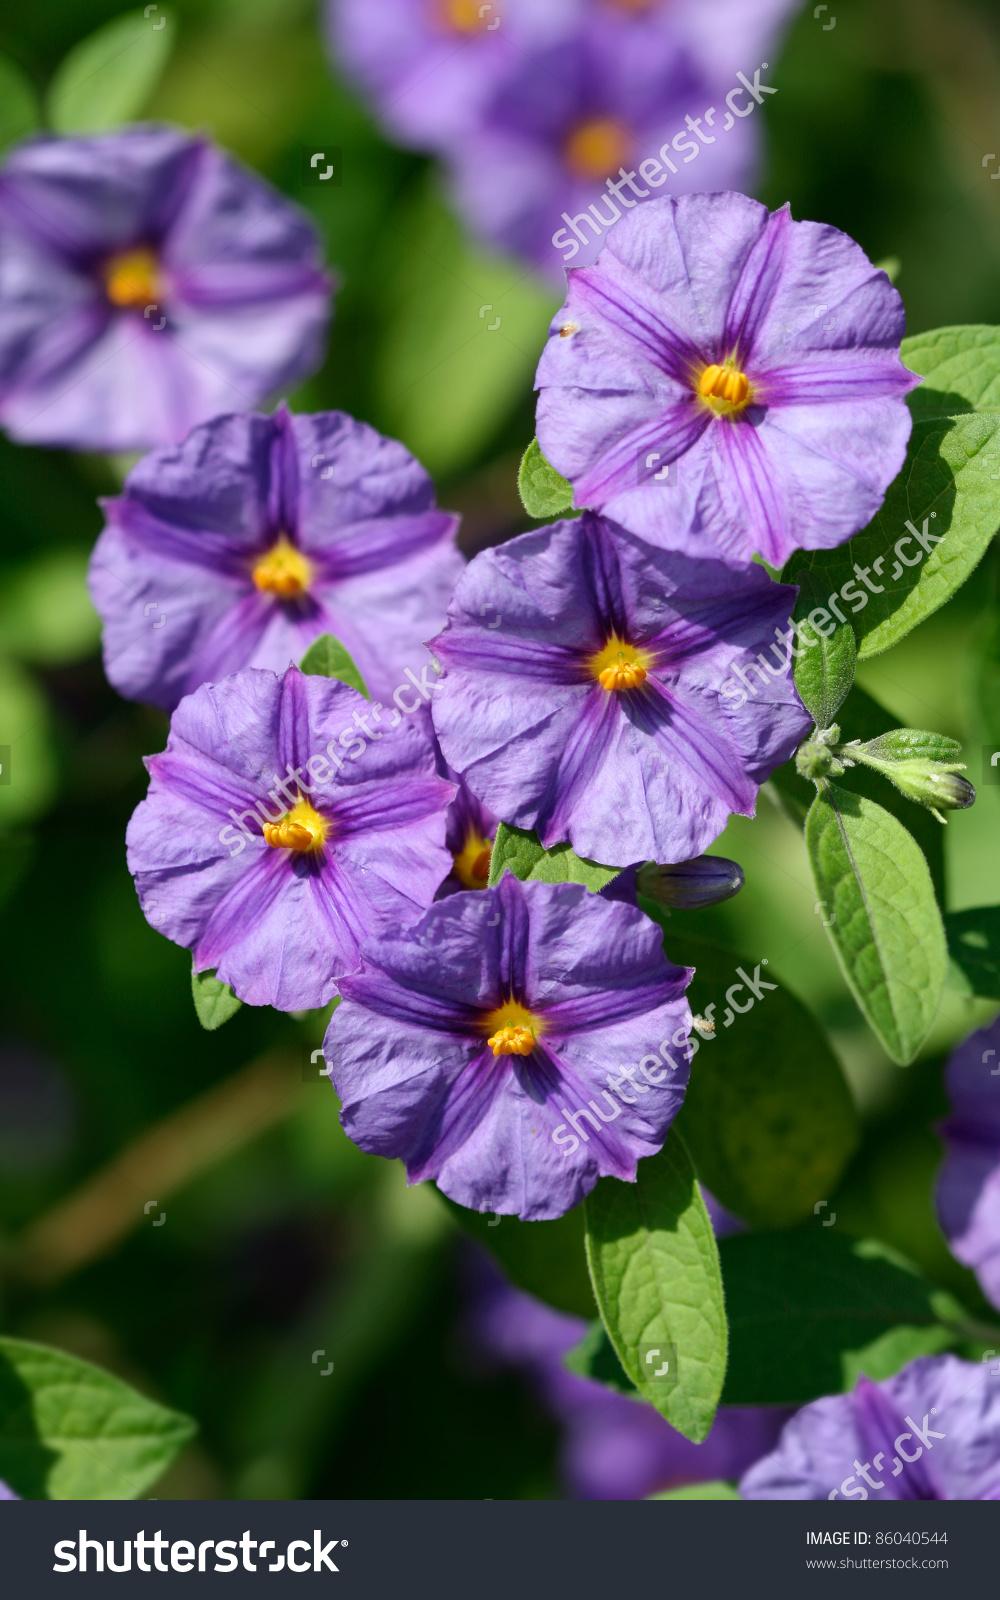 Purple Flowers Of Lycianthes Rantonnetii Or Blue Potato Bush Stock.